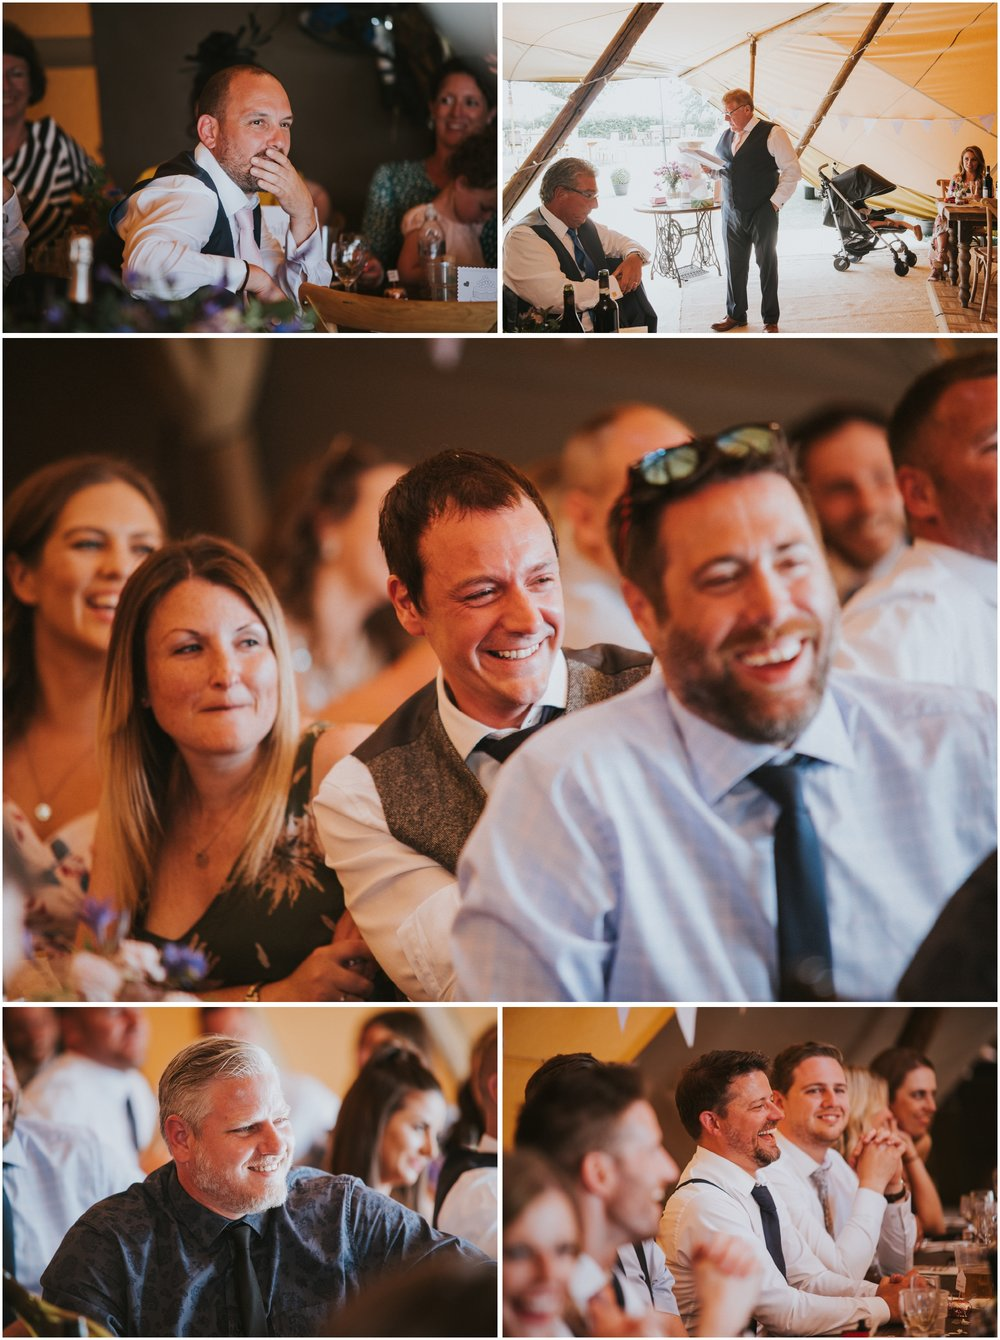 SkipbridegFarmWedding-LukeHolroyd-Yorkshirewedding_0104.jpg